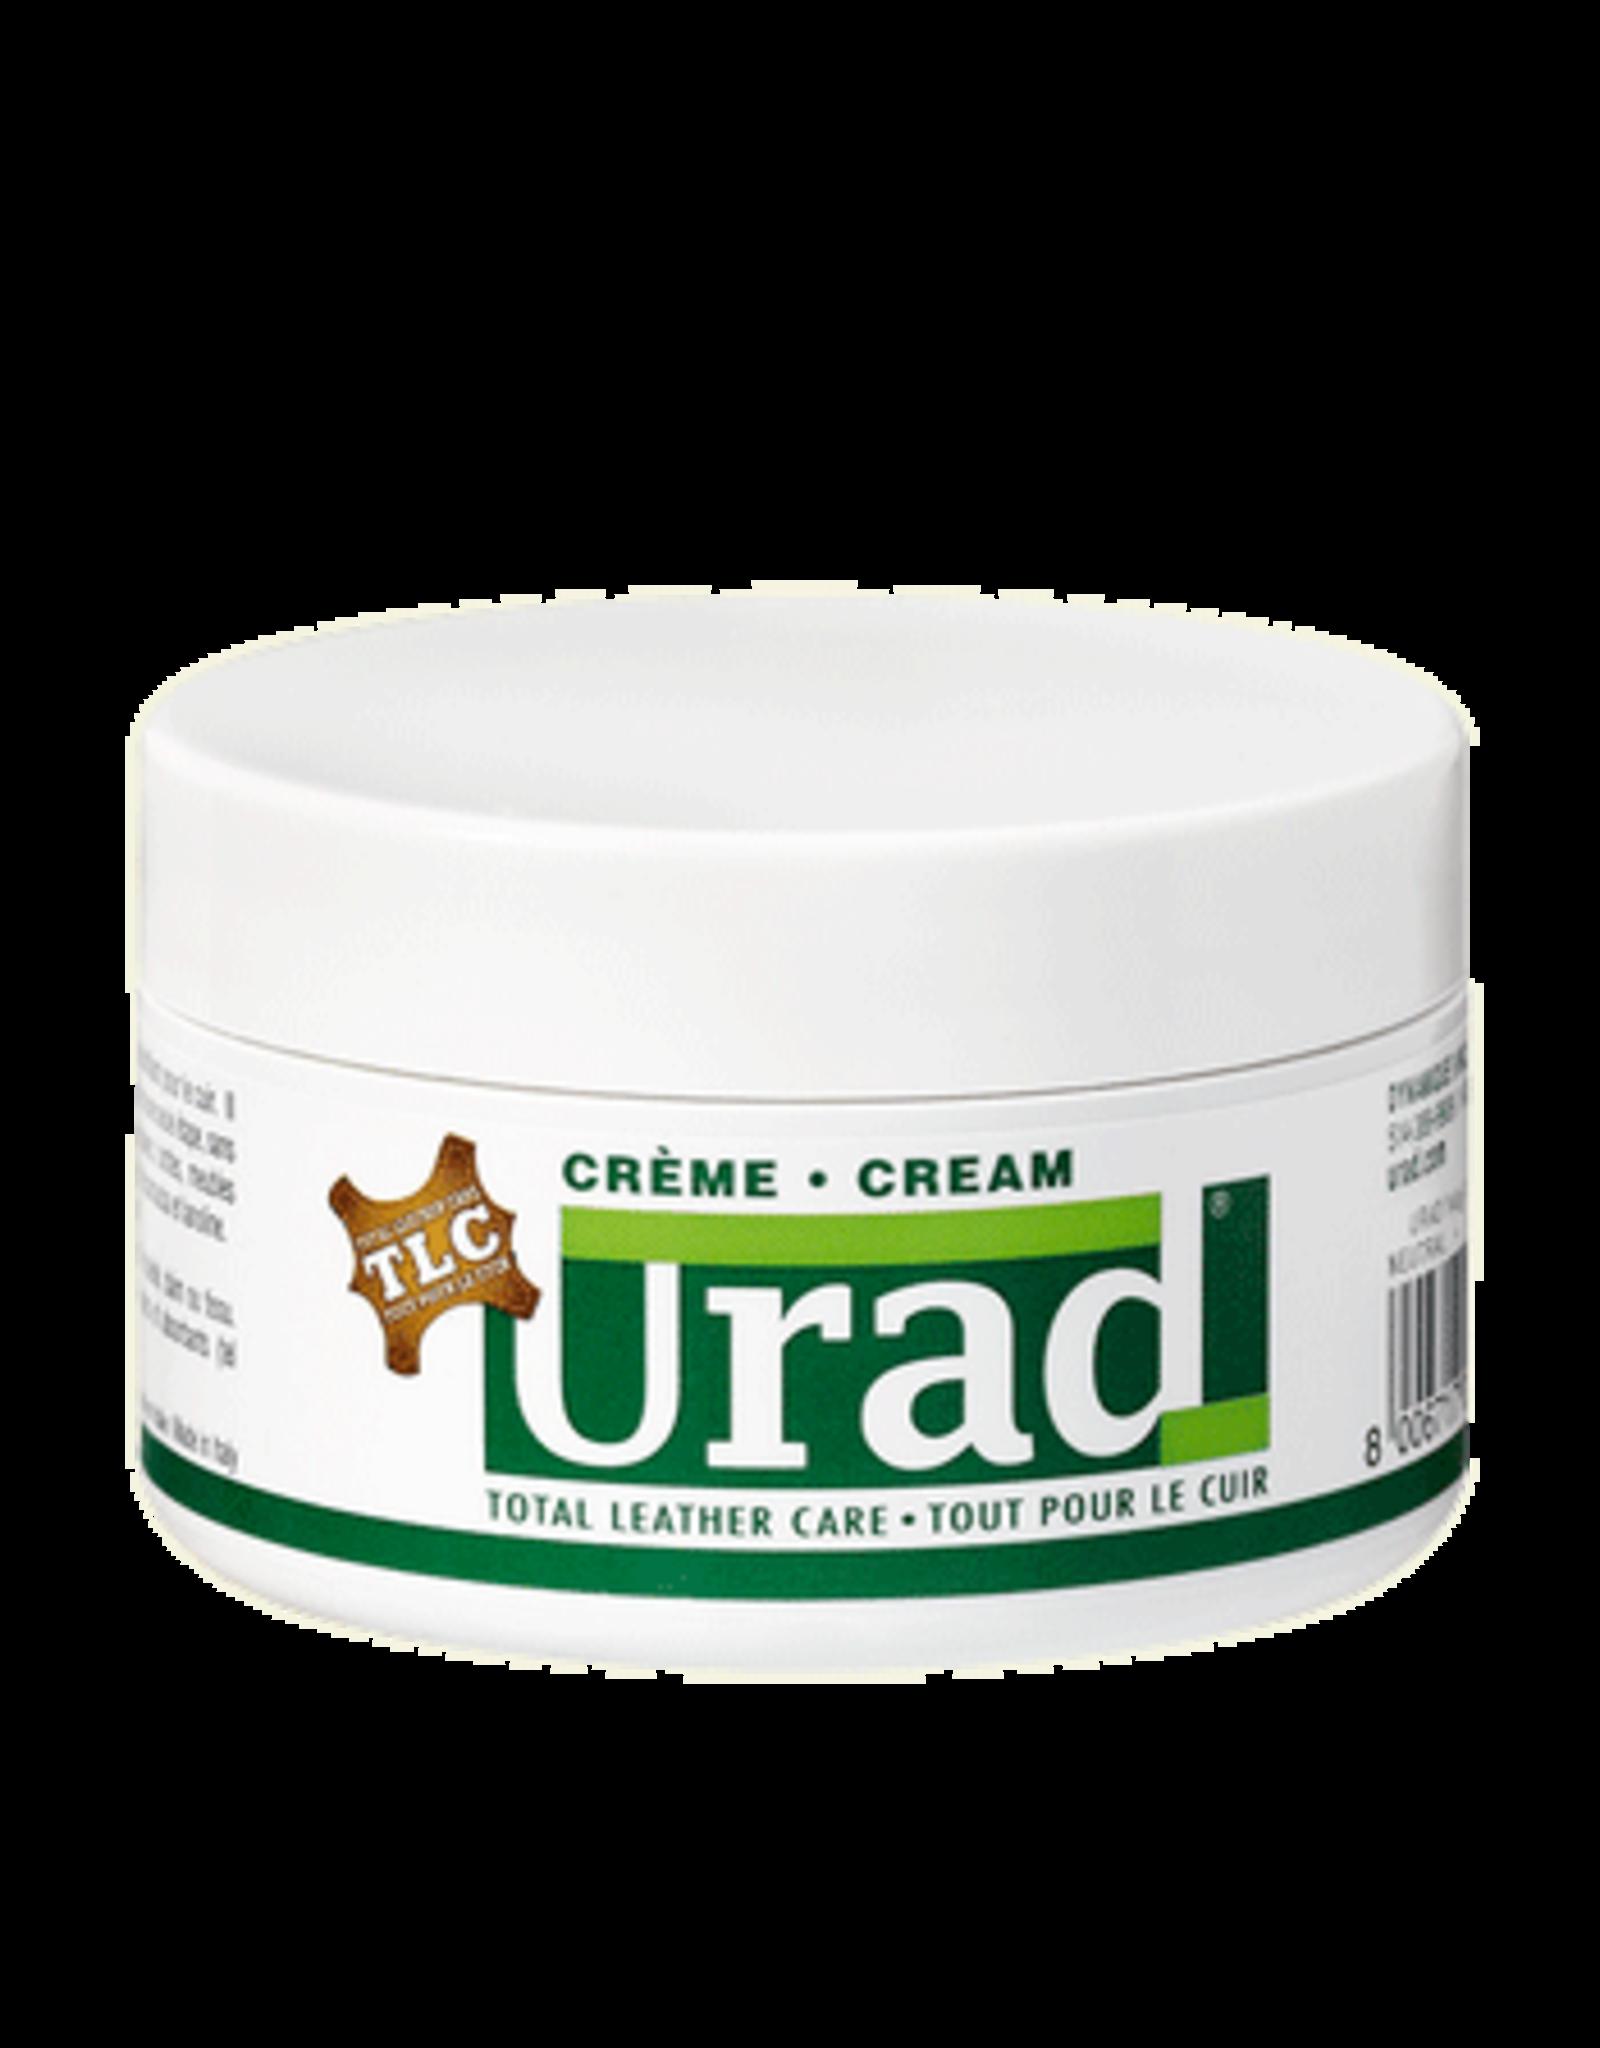 URAD's leather cream - economical size 140 ml